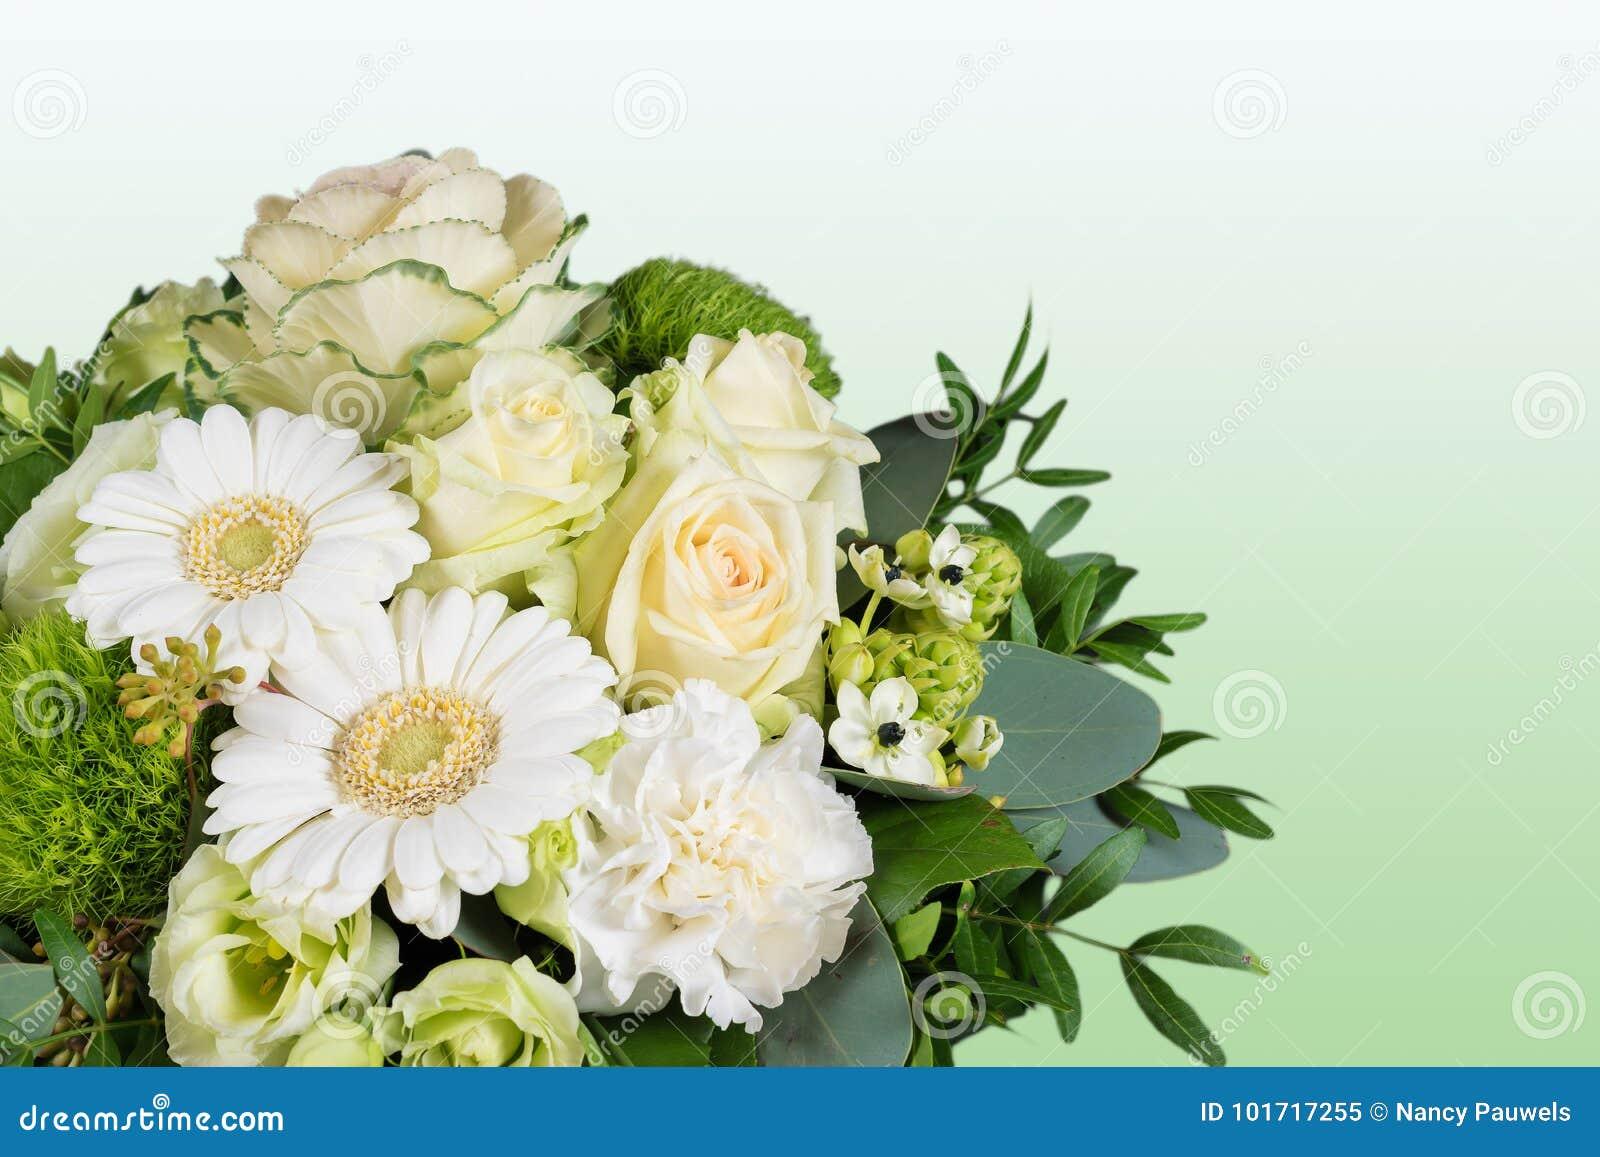 Ramo blanco de flores frescas en fondo verde